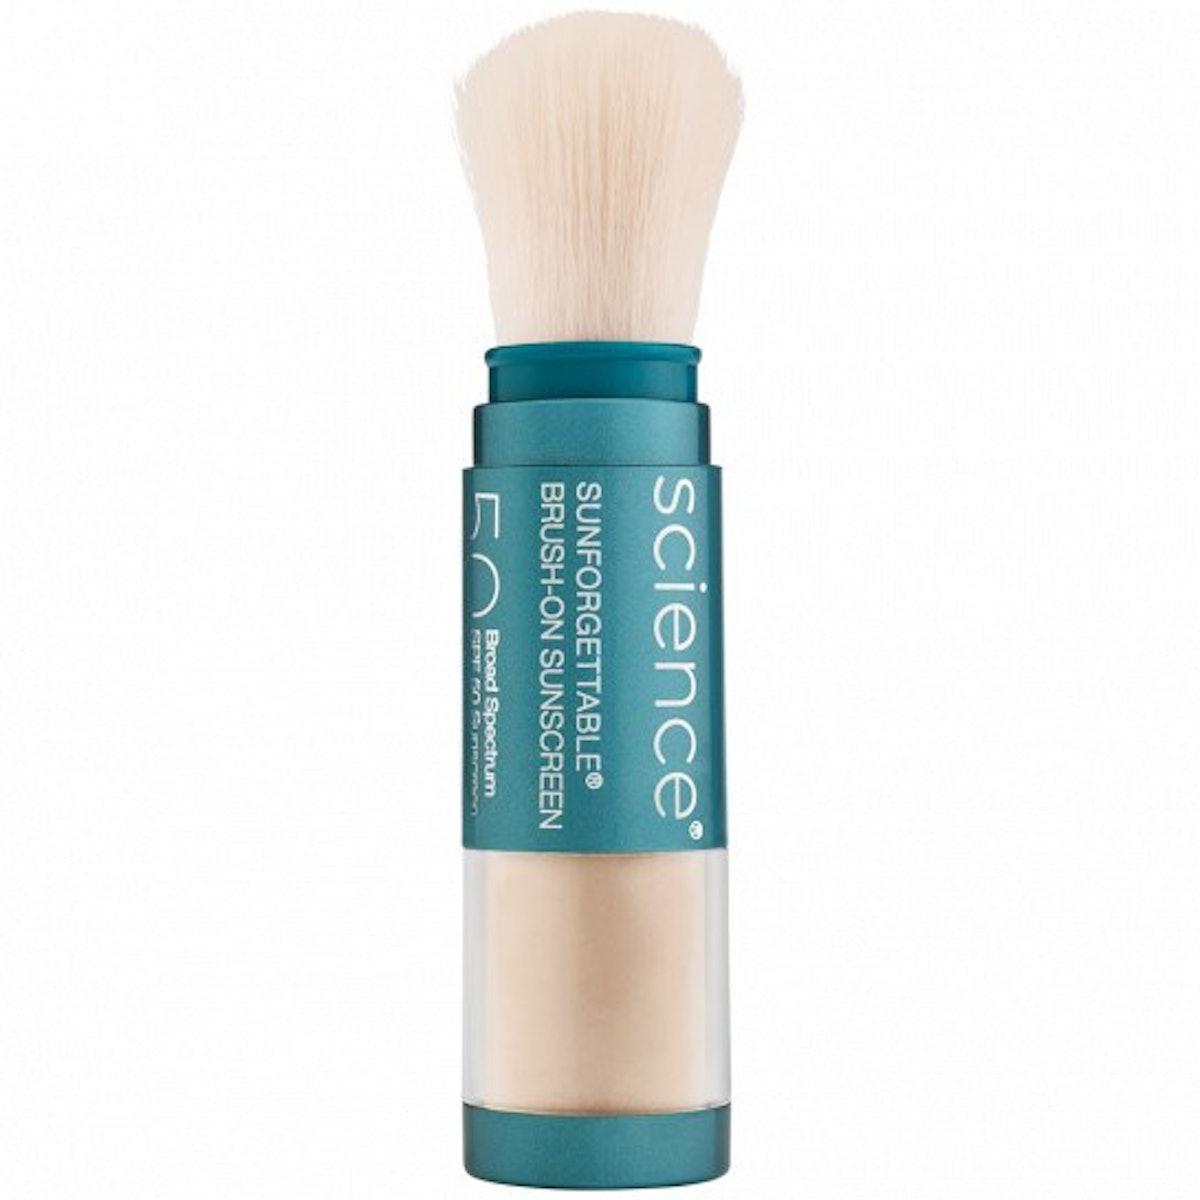 Colorescience Sunforgettable Brush-On Sunscreen SPF 50